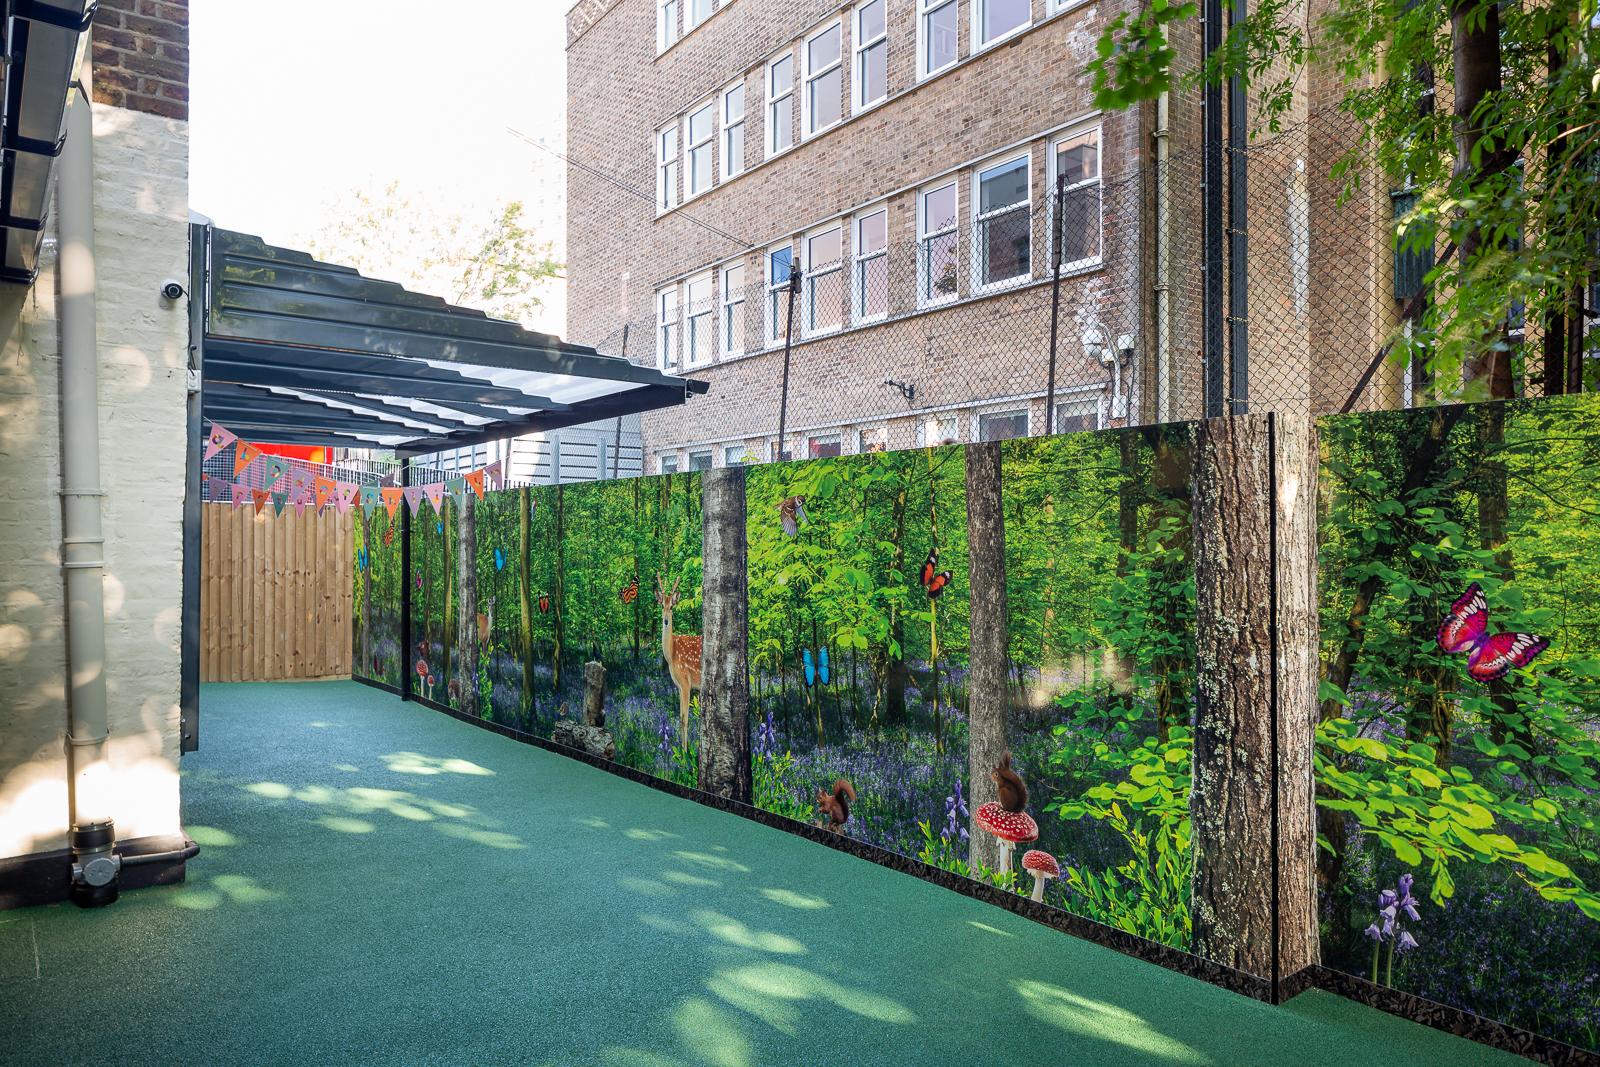 Image iof external wall art design for nursery